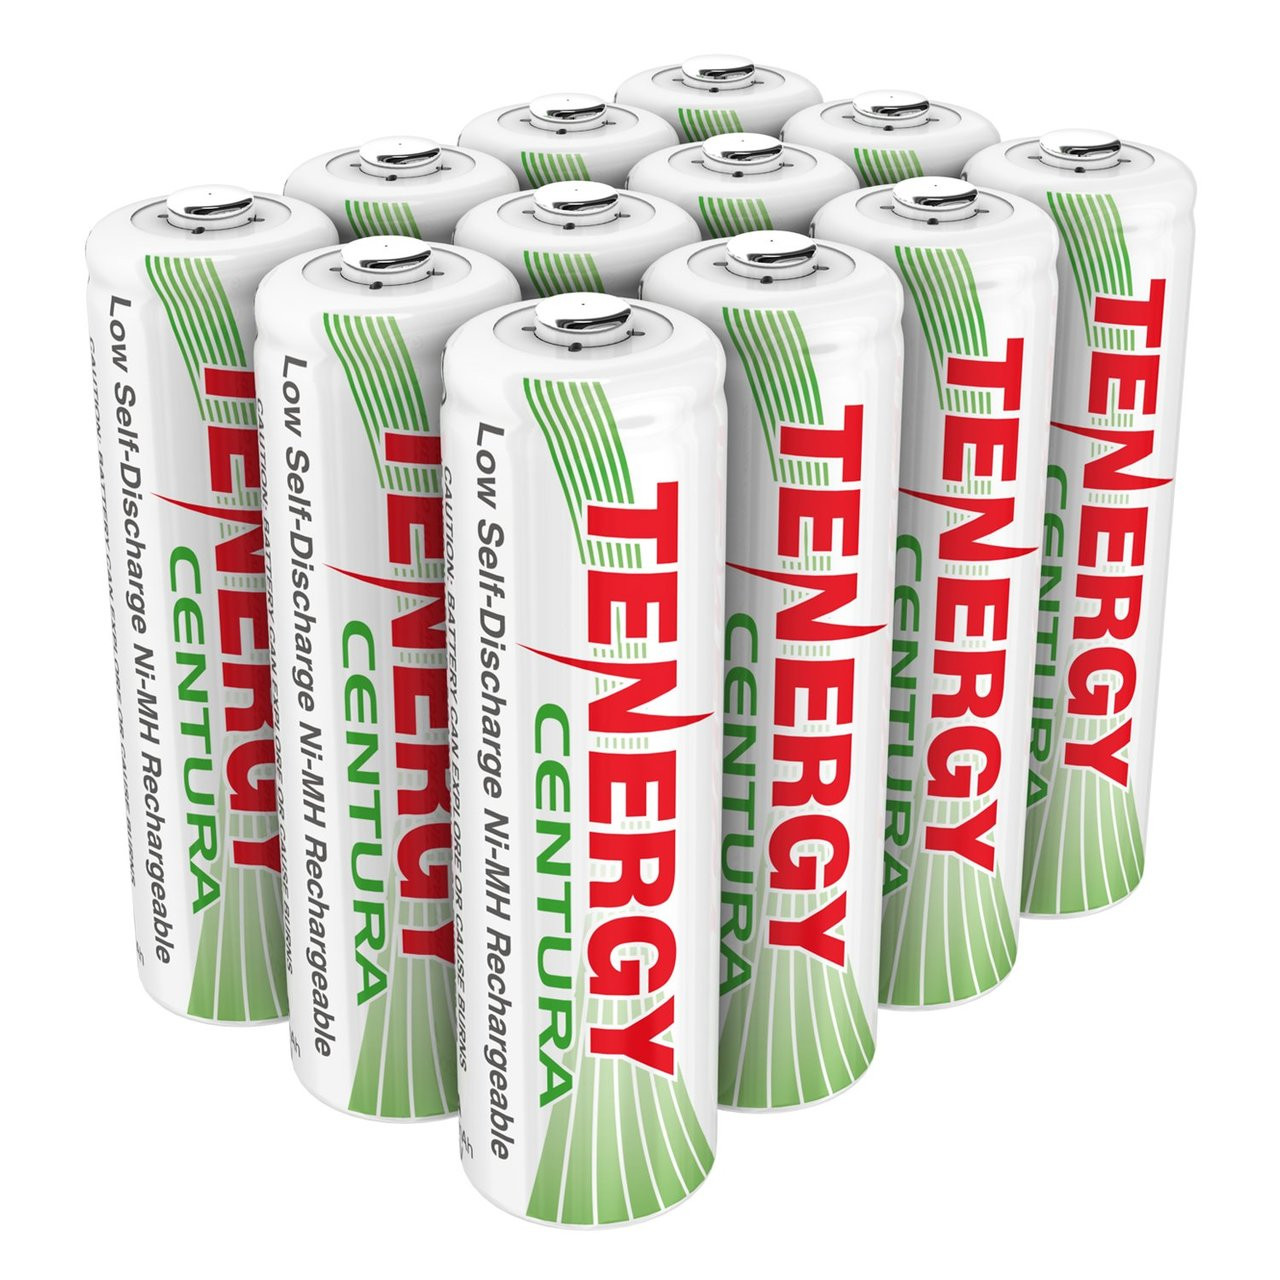 Combo: Tenergy Centura NiMH AA 1.2V 2000mAh Rechargeable Batteries, 12-Pack